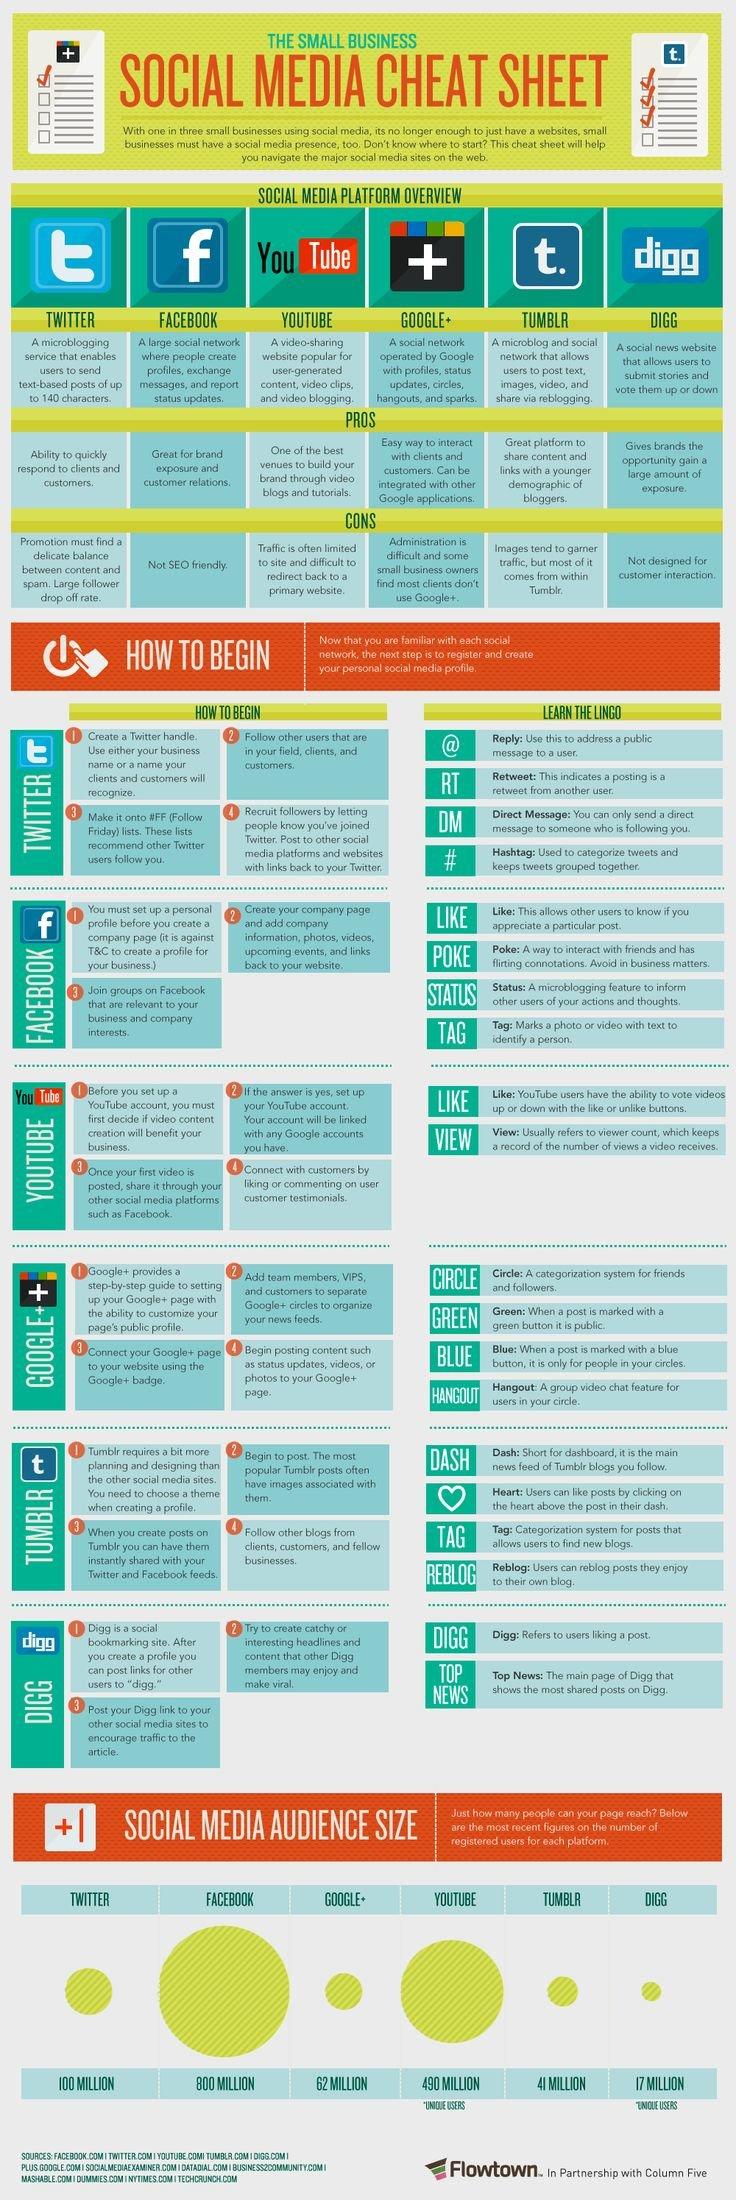 Social Media Cheat Sheet #infographic